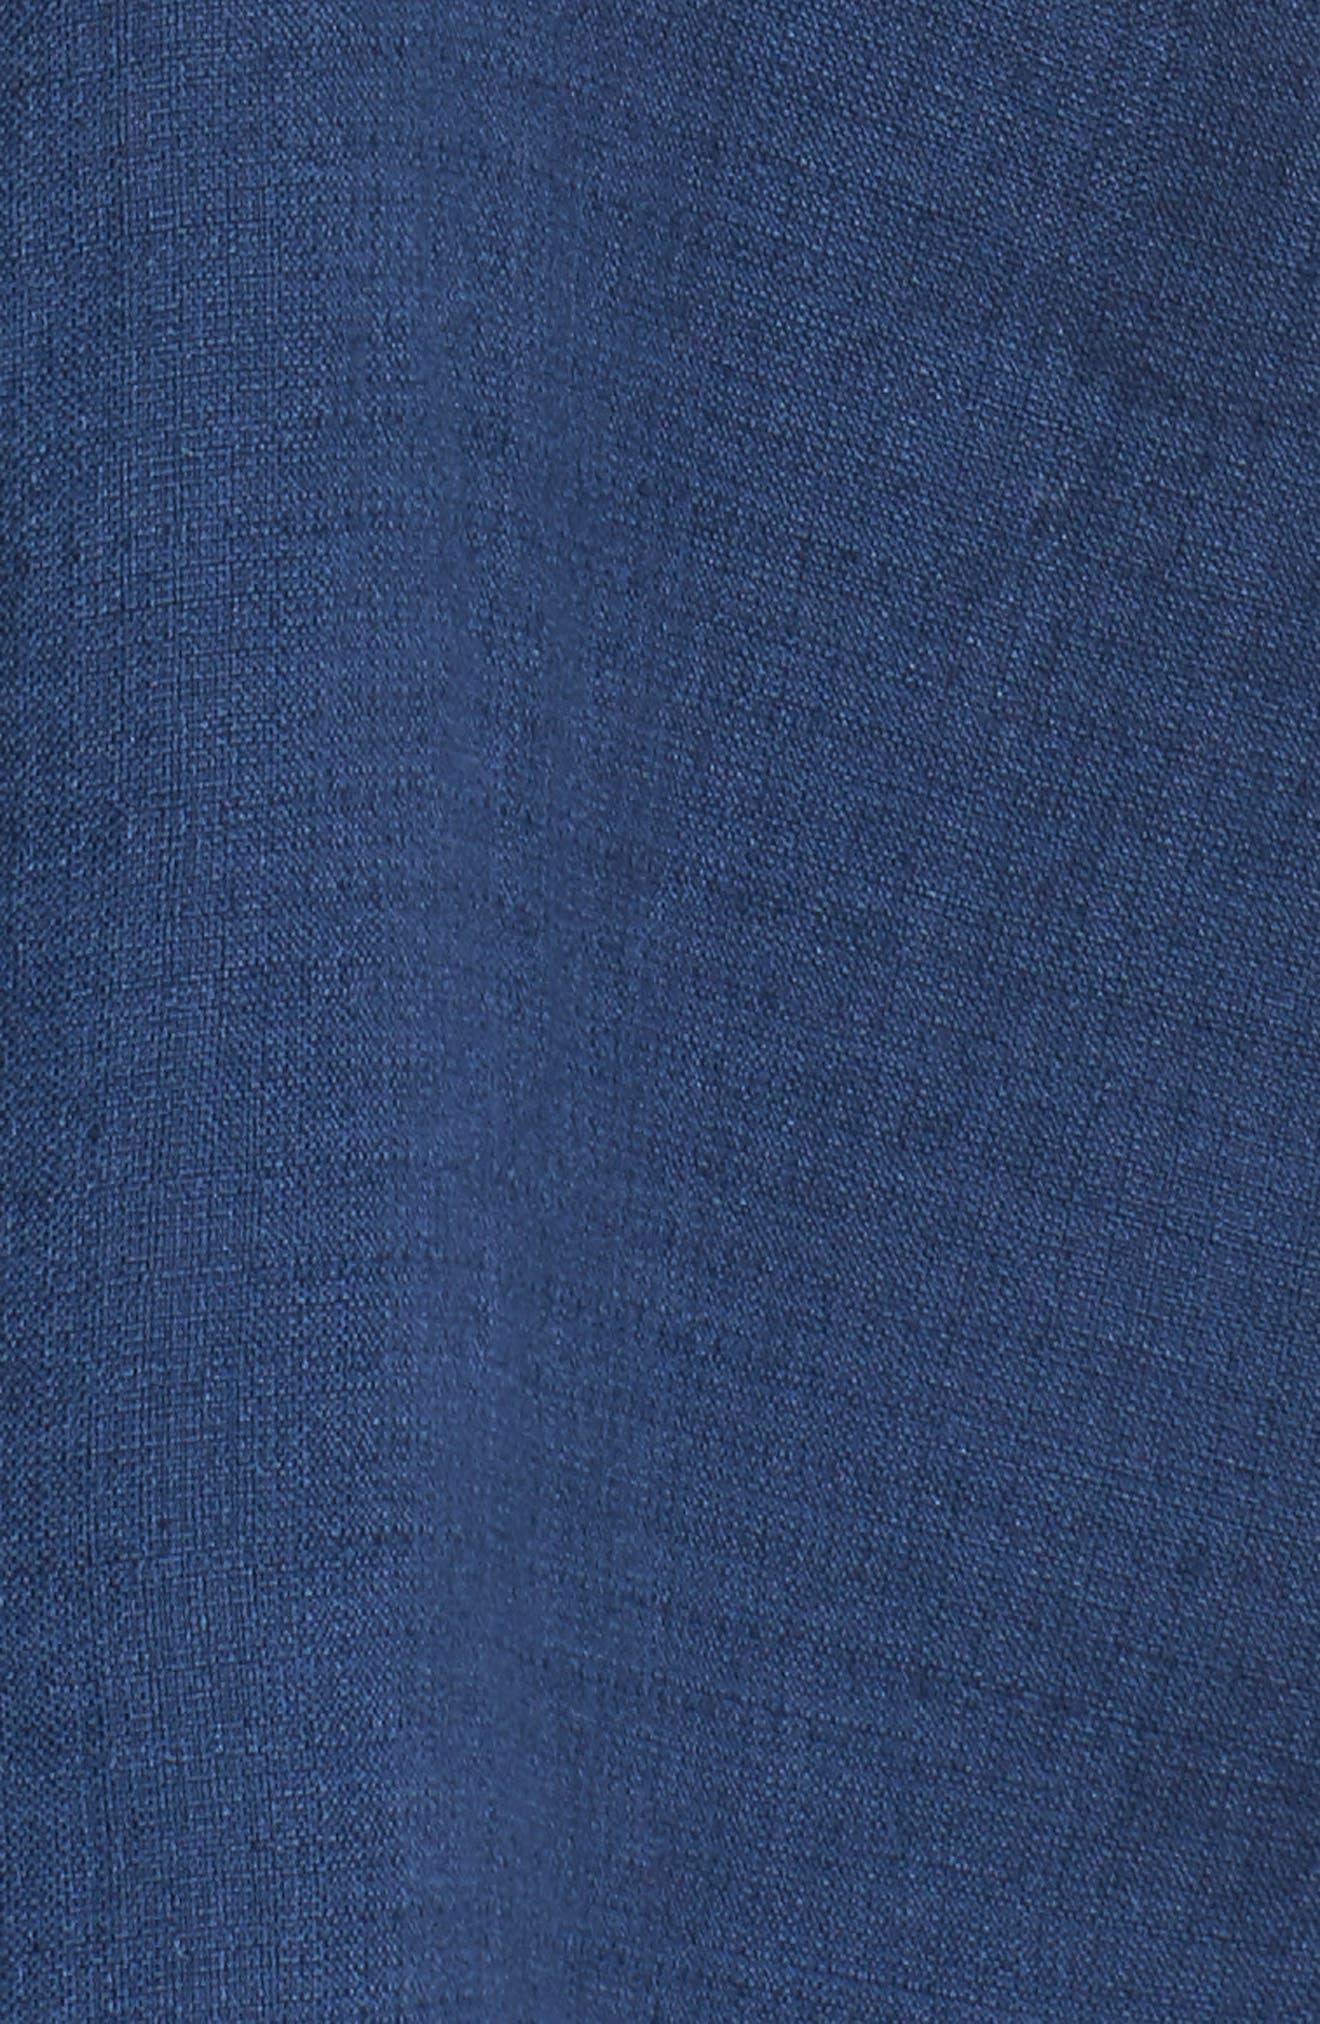 Woven Linen Blend Blouse,                             Alternate thumbnail 5, color,                             Denim